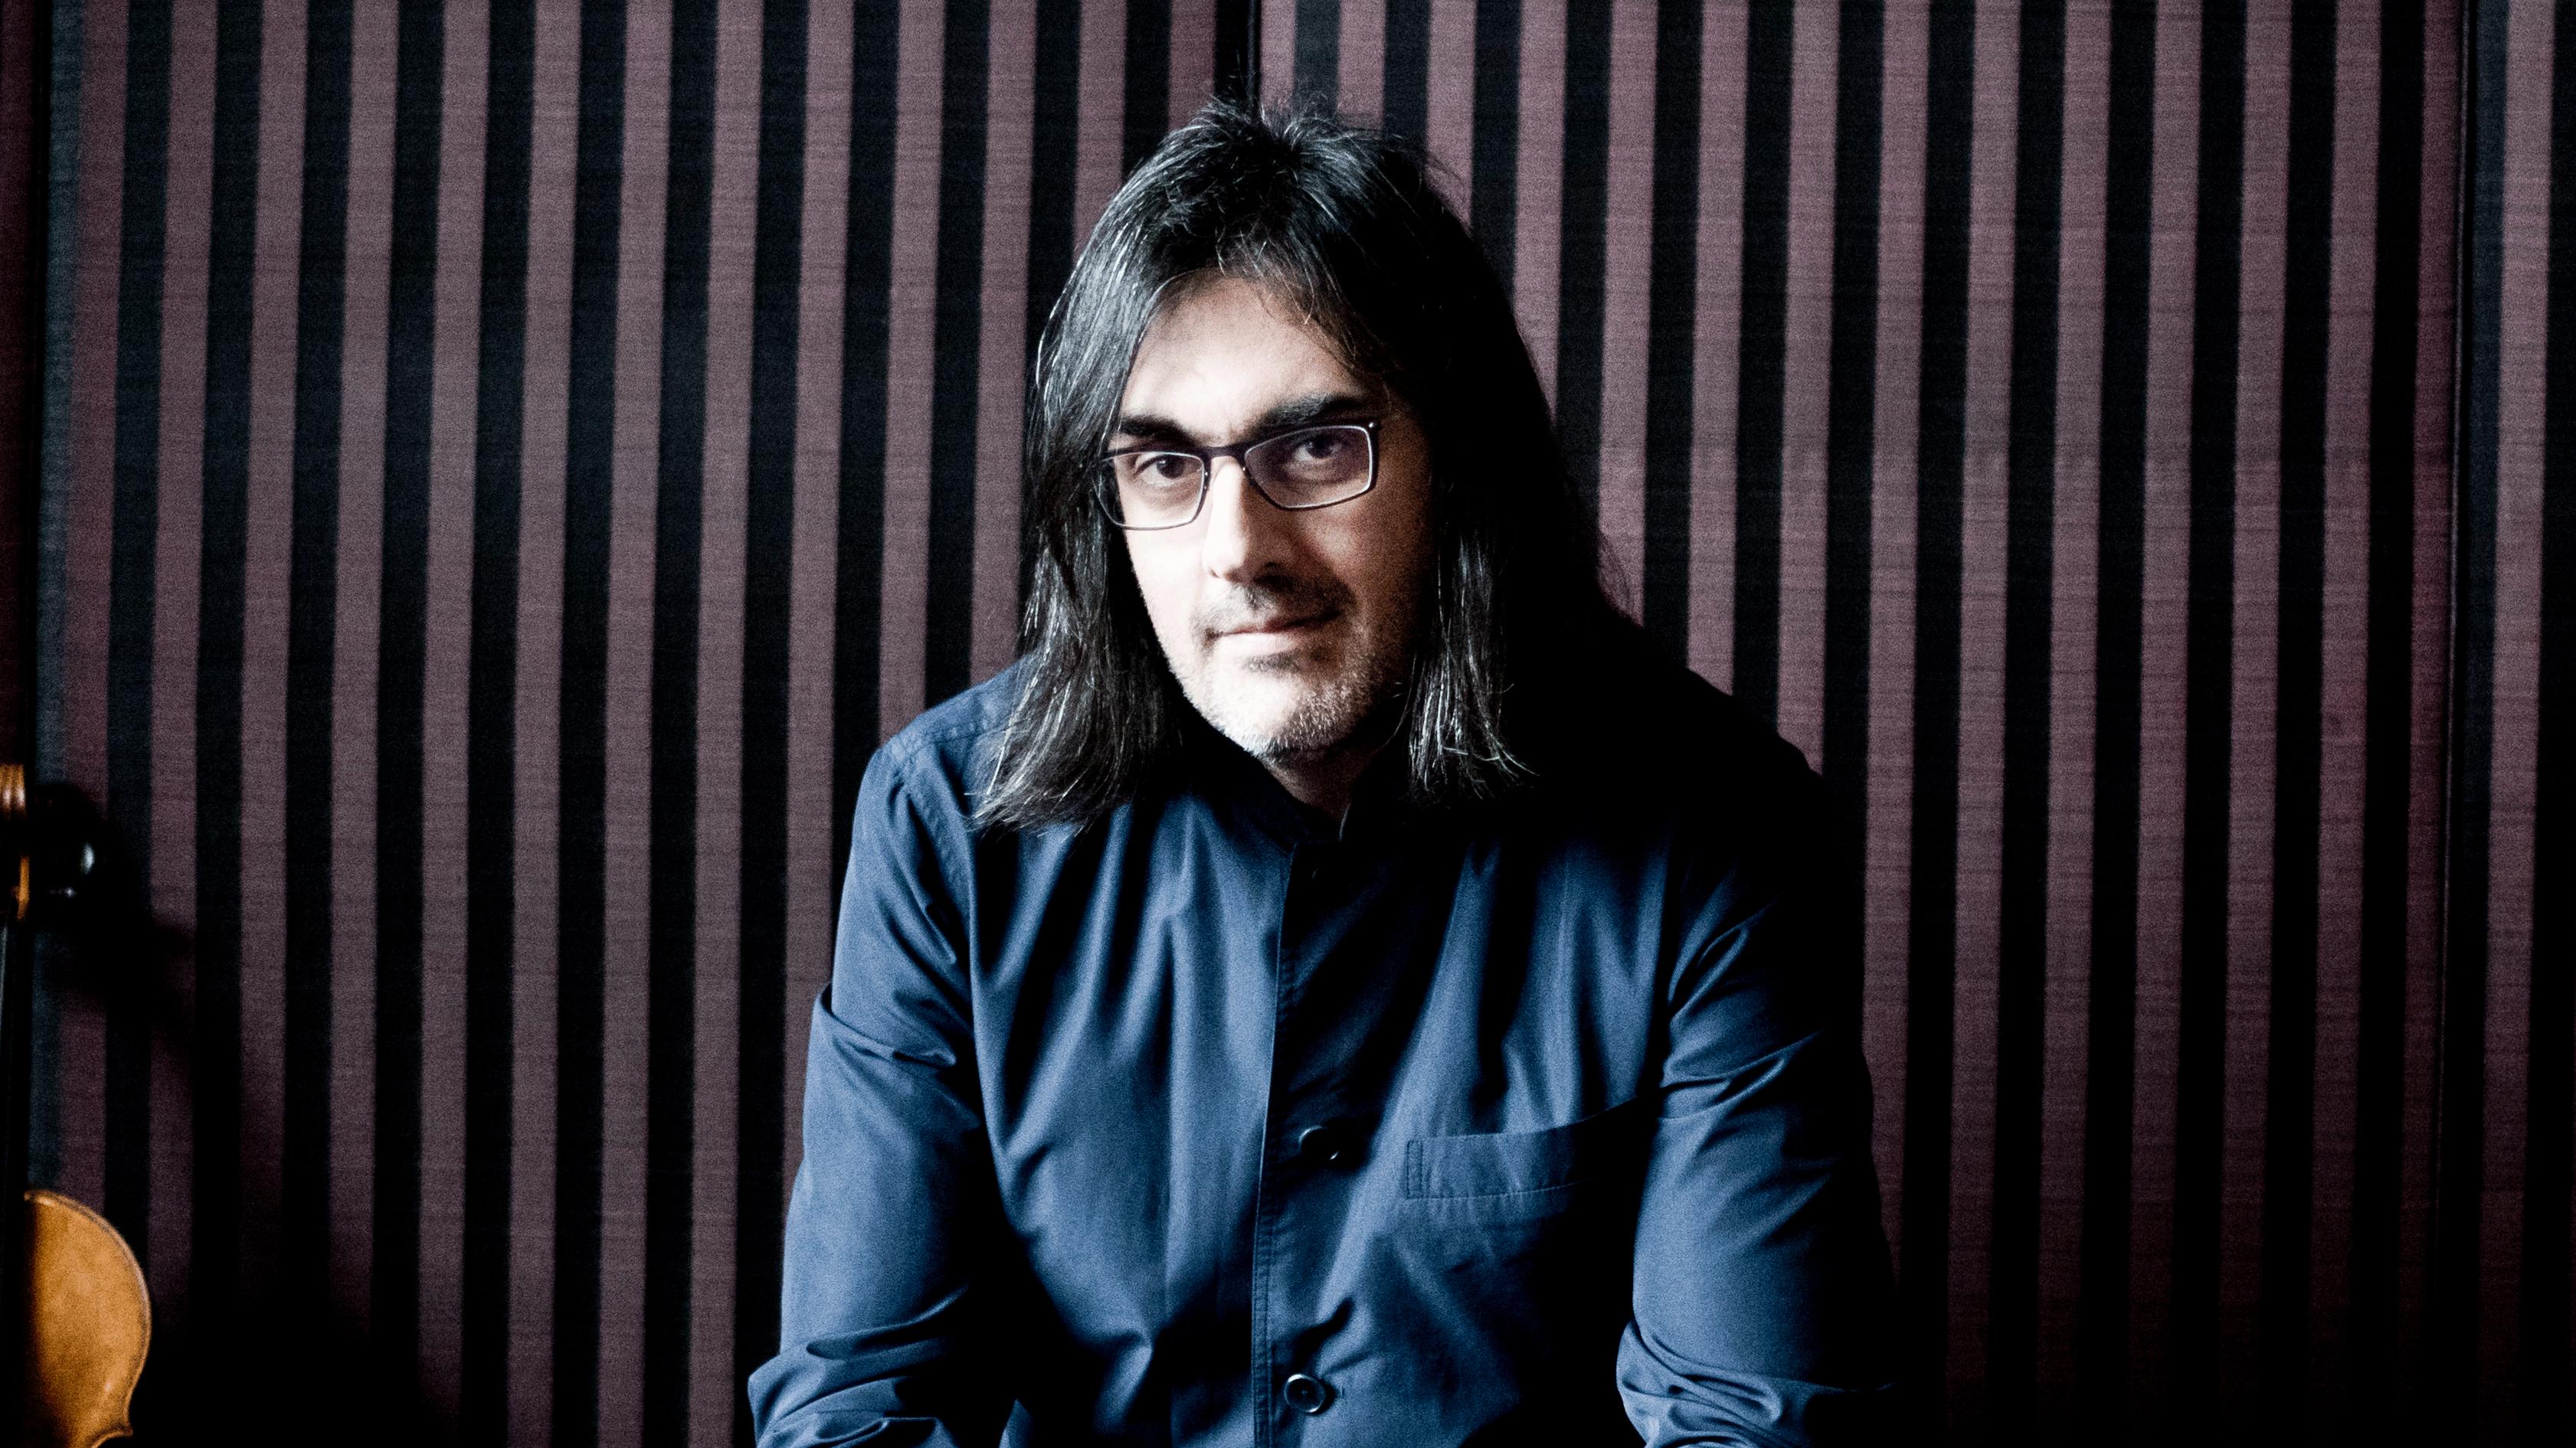 Lahav Shani conducts Daniel Shalit, Shostakovich and Berlioz – With Leonidas Kavakos